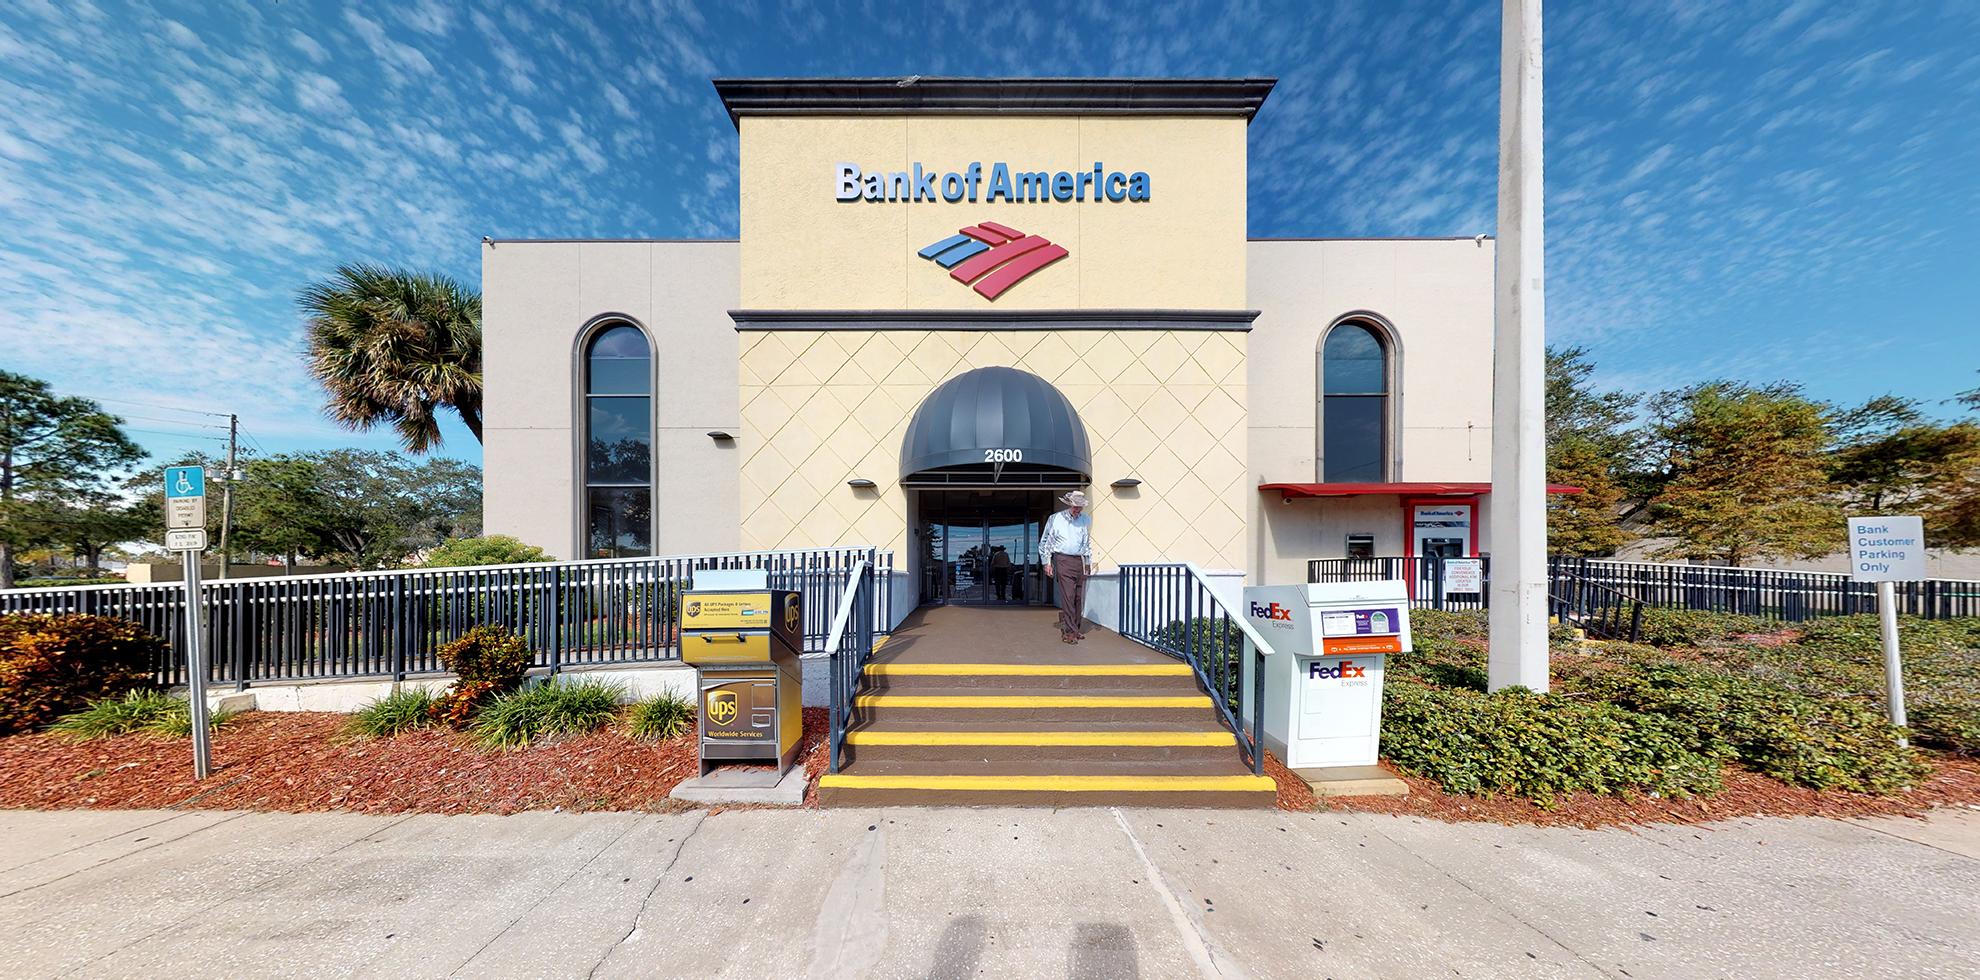 Bank of America financial center with drive-thru ATM | 2600 E Bay Dr, Largo, FL 33771